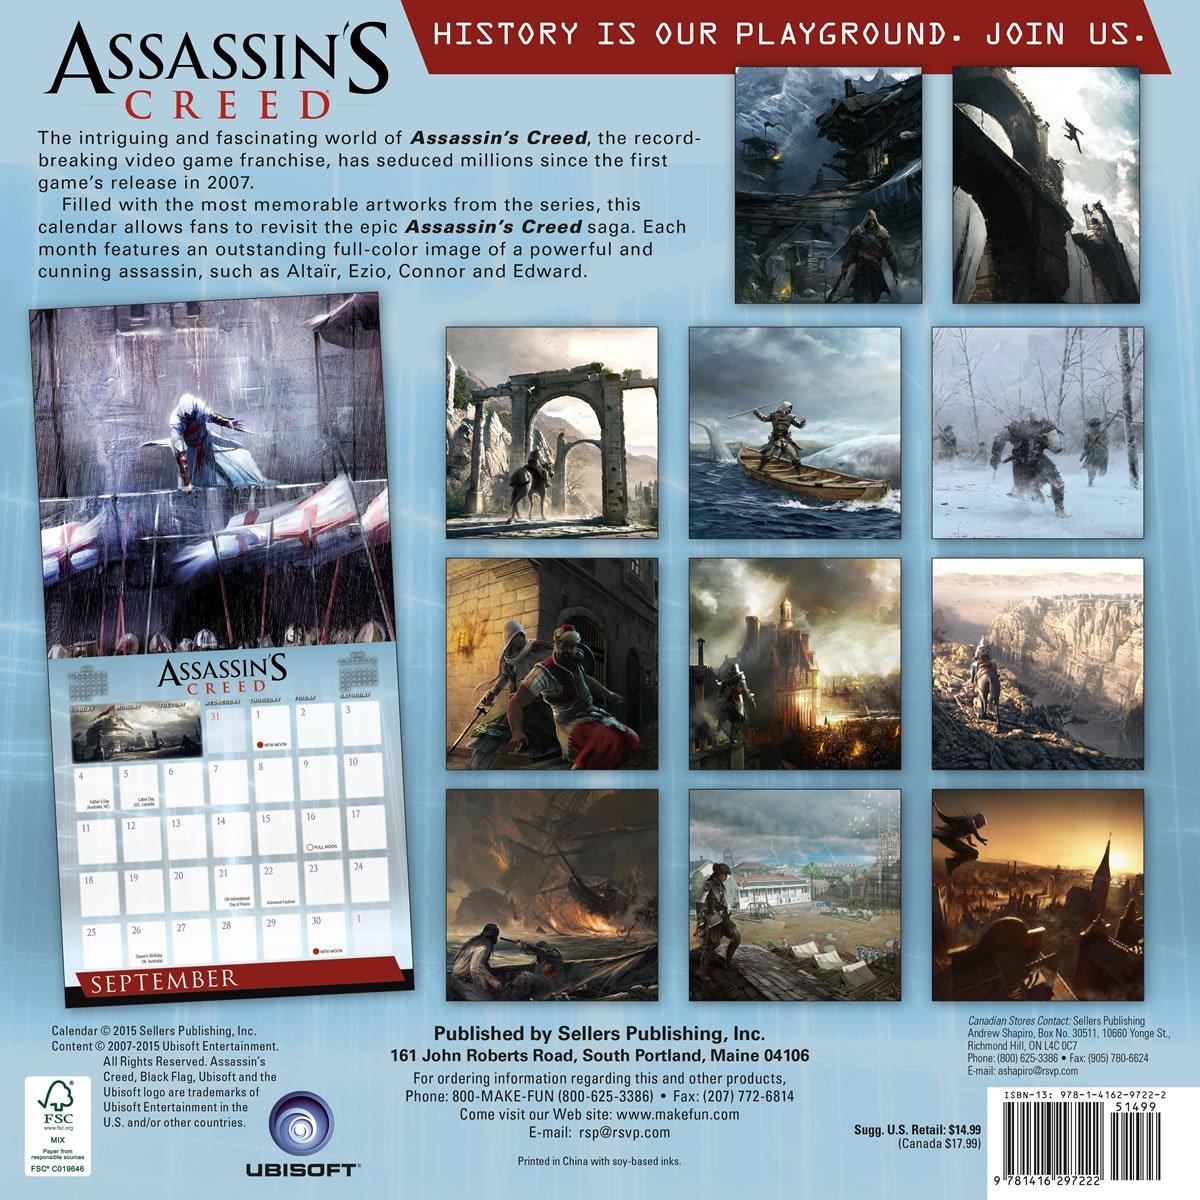 Calendario Ubisoft.Assassins Creed 2016 Wall Calendar Ubisoft Entertainment